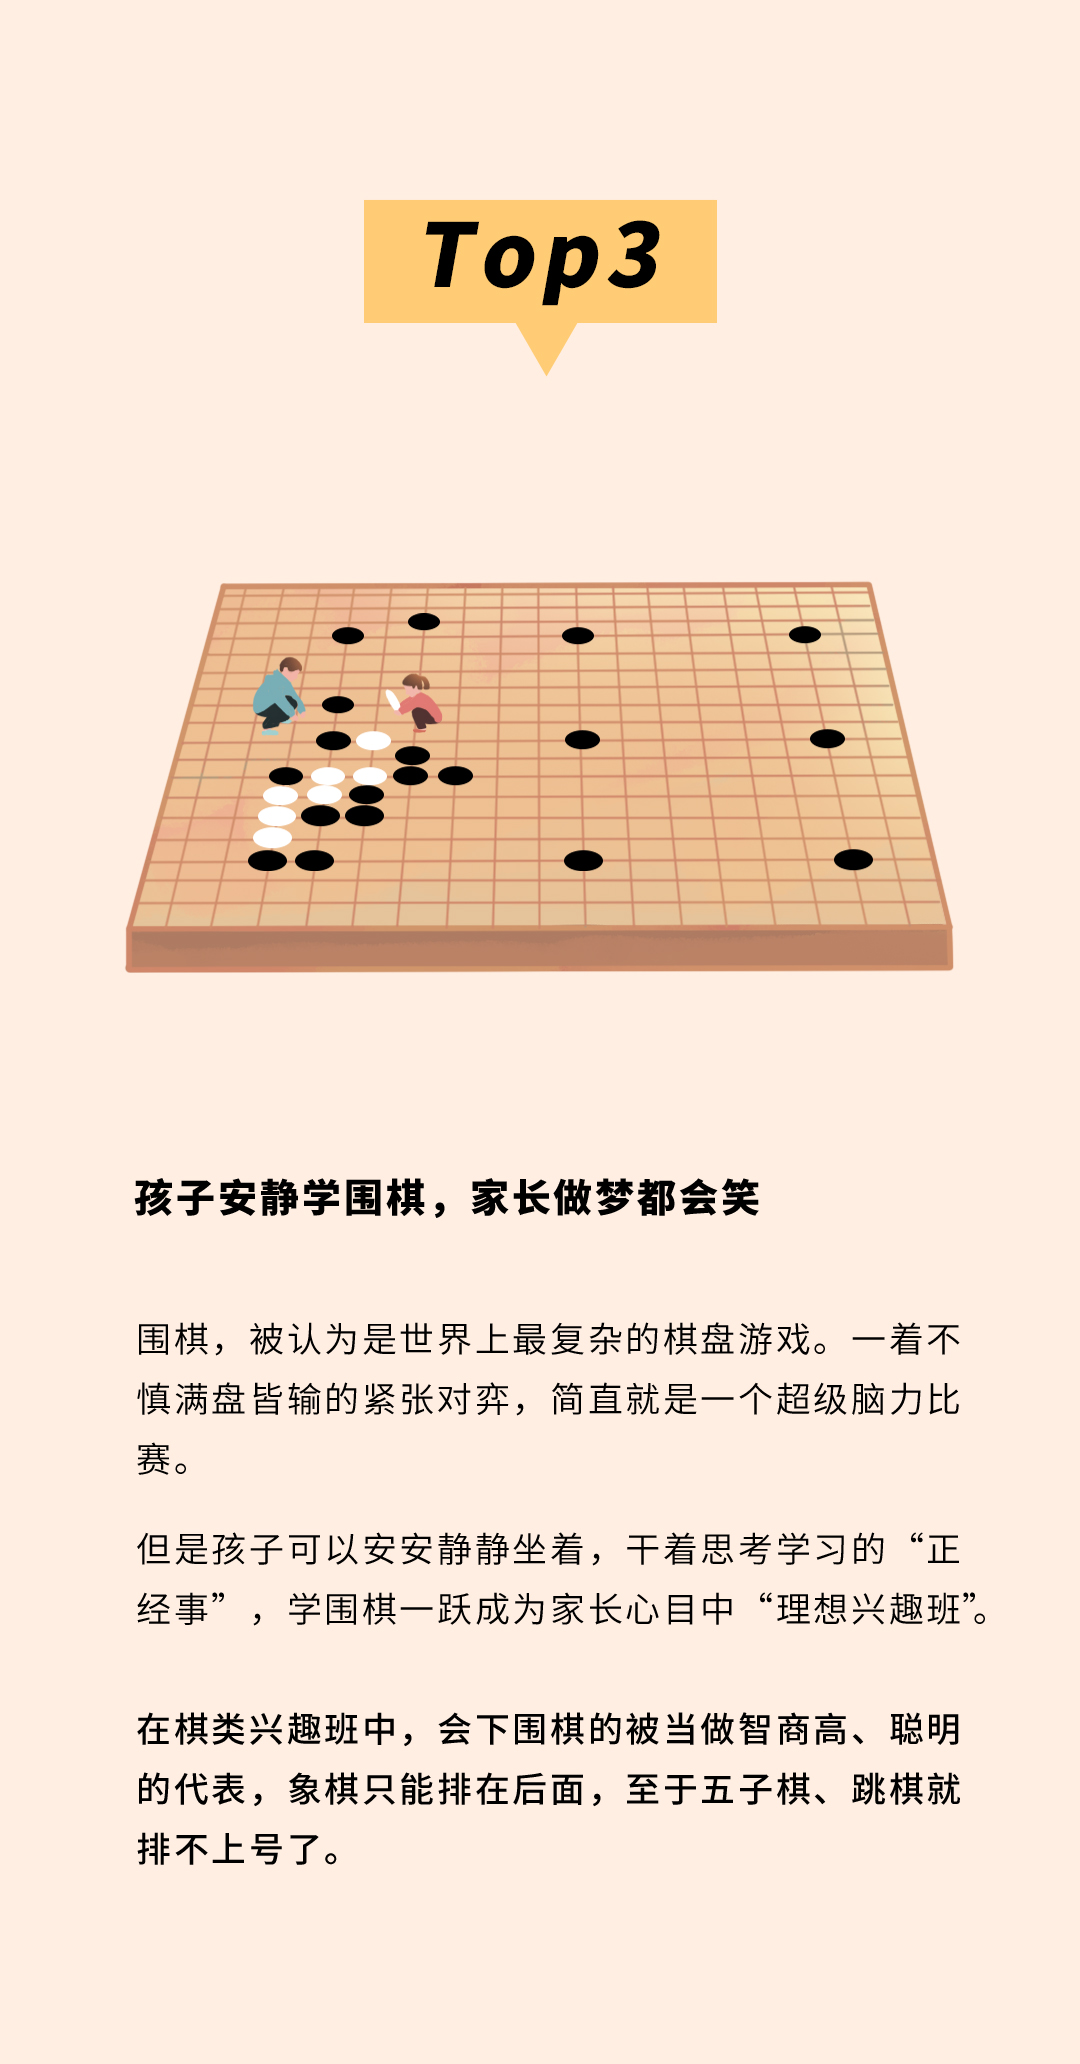 https://level8cases.oss-cn-hangzhou.aliyuncs.com/GMT微博切图9-7482eb72-567b-4e20-a6b6-8054604a60dc.jpg